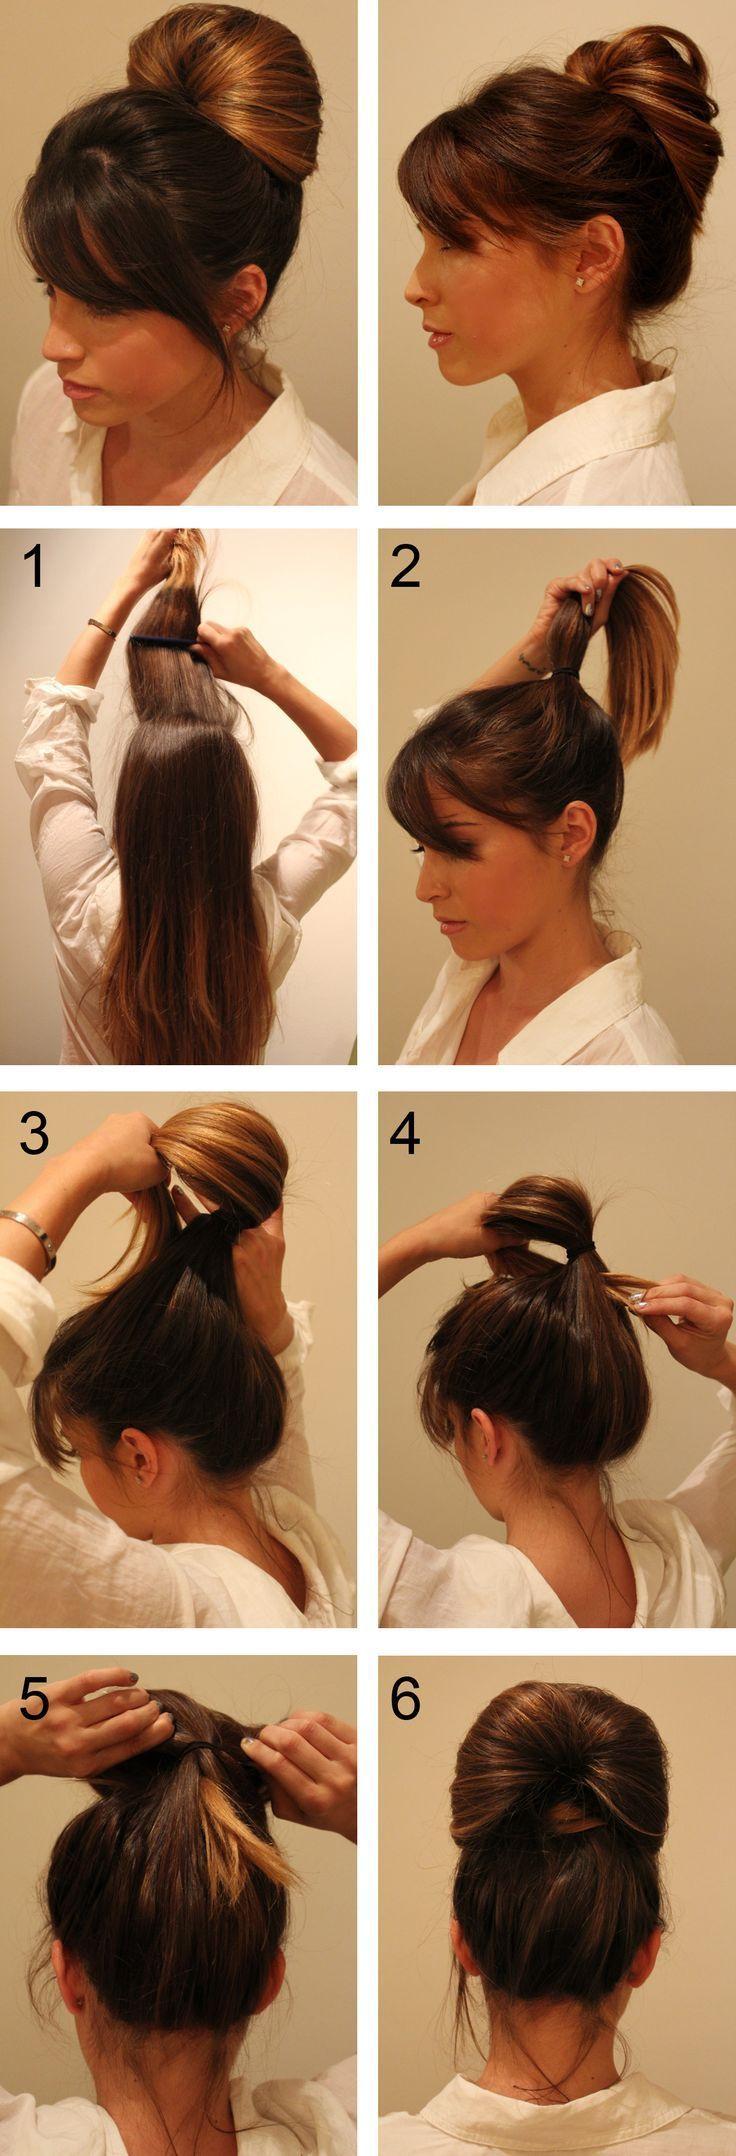 Peachy 1000 Ideas About Lazy Hair Updo On Pinterest Hair Styles Easy Short Hairstyles For Black Women Fulllsitofus